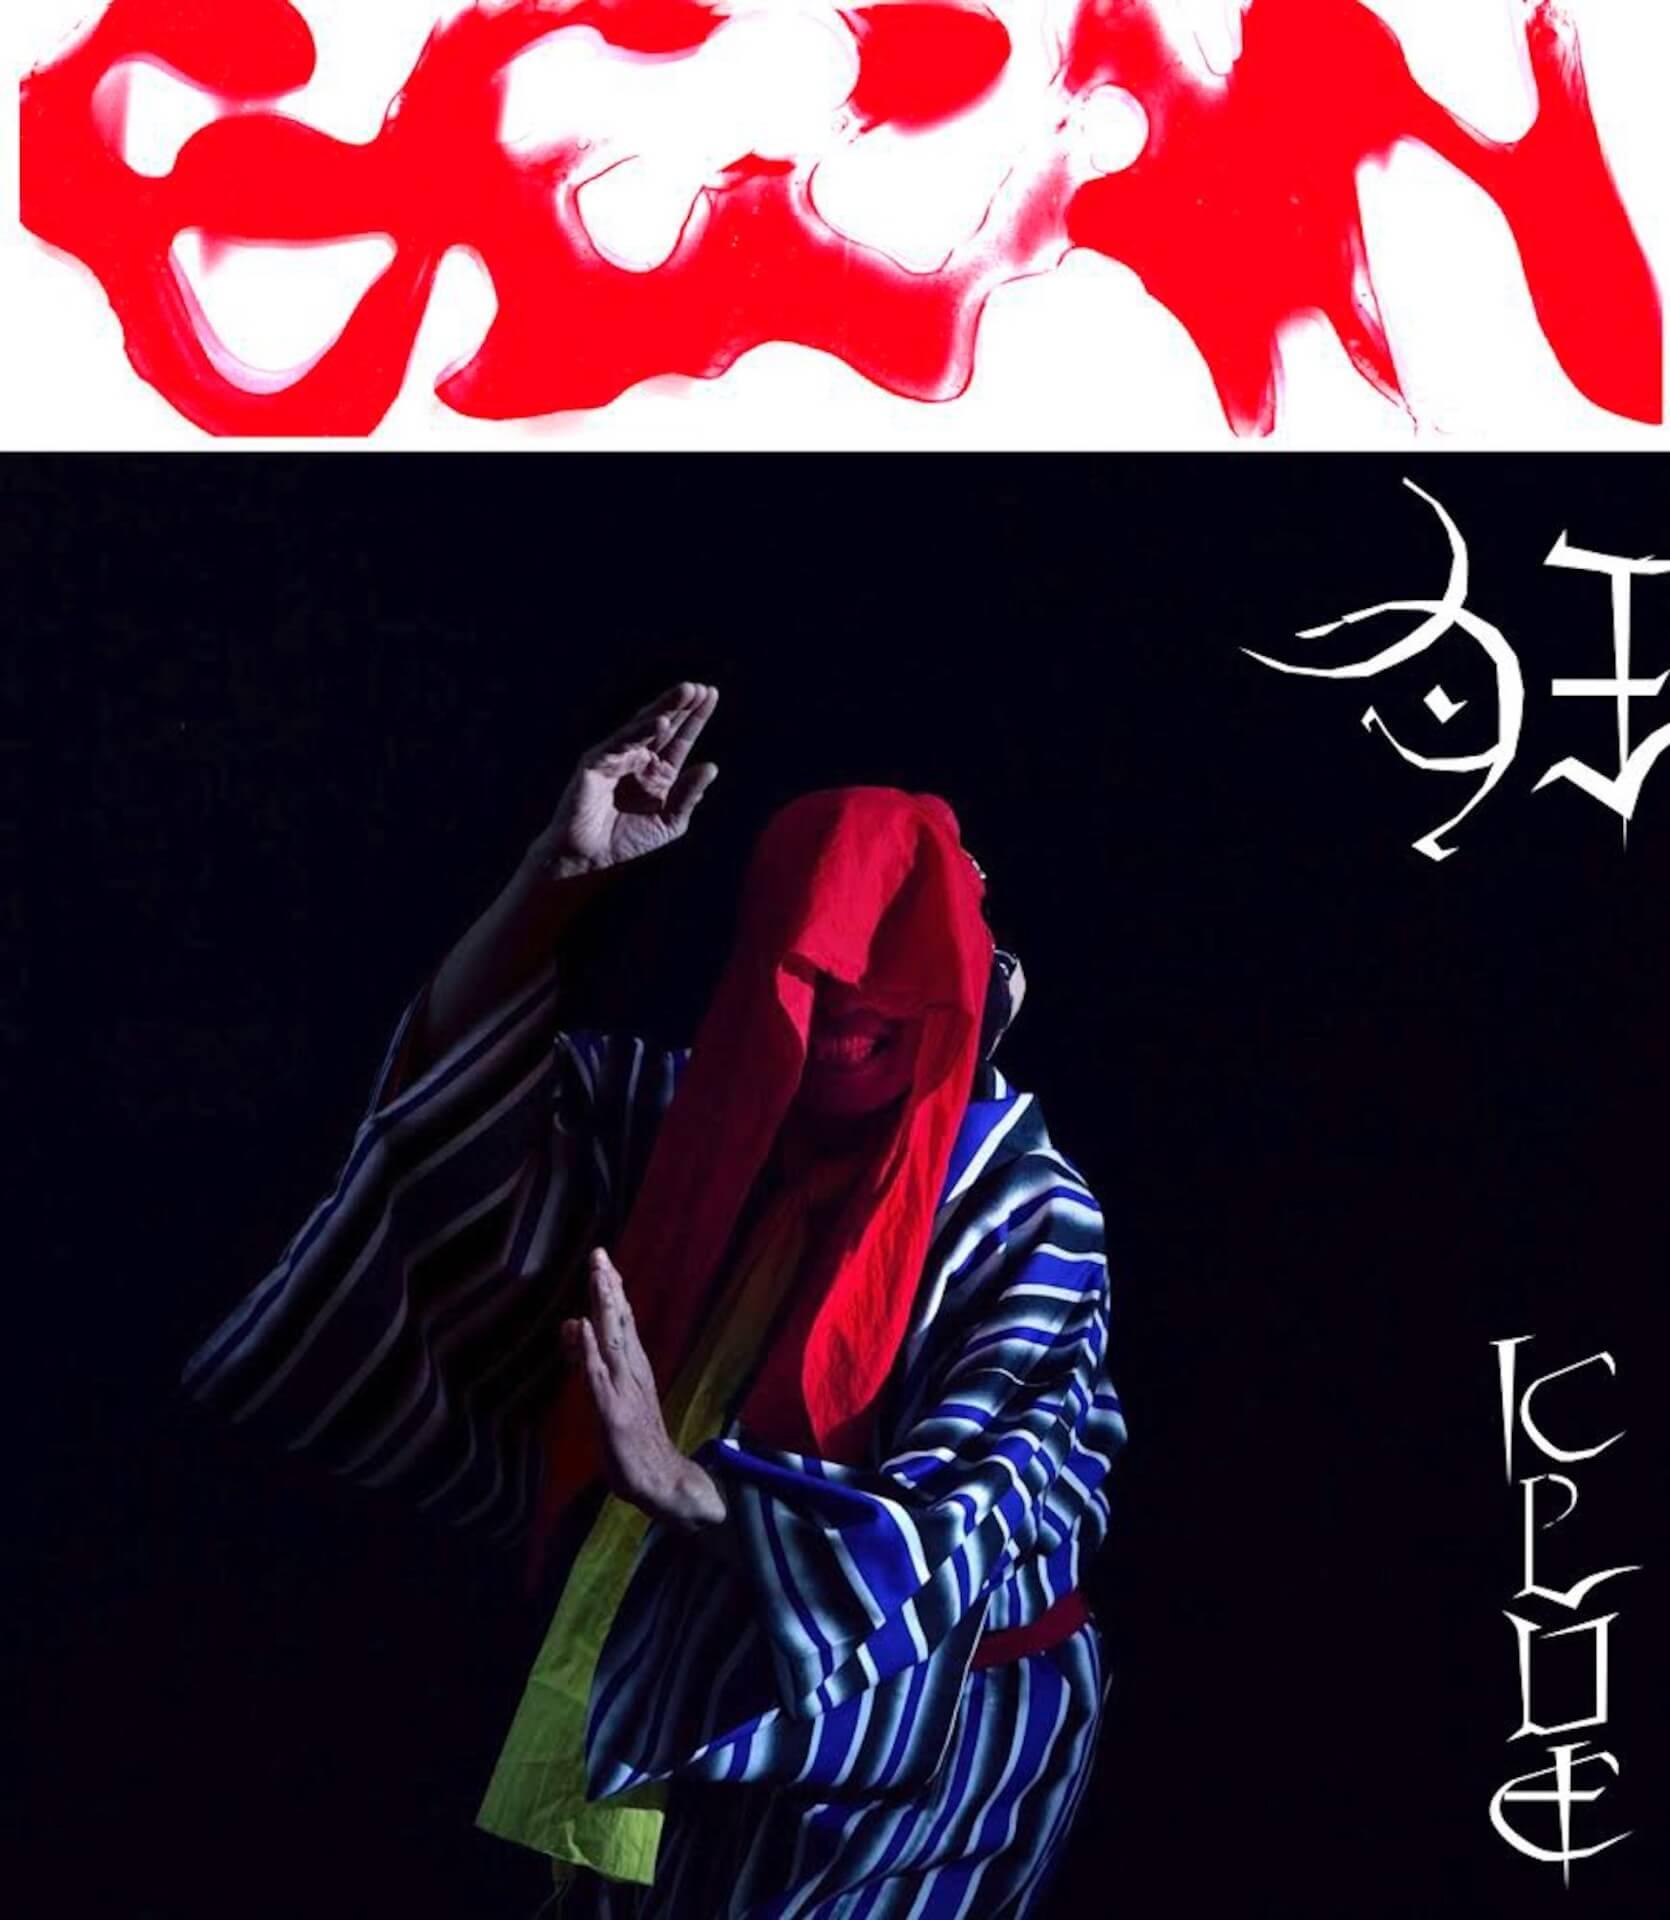 GEZAN、本日リリースのアルバム『狂(KLUE)』から「赤曜日」のMVを公開|SUPER DOMMUNEでリリースパーティーも music200129_gezan_1